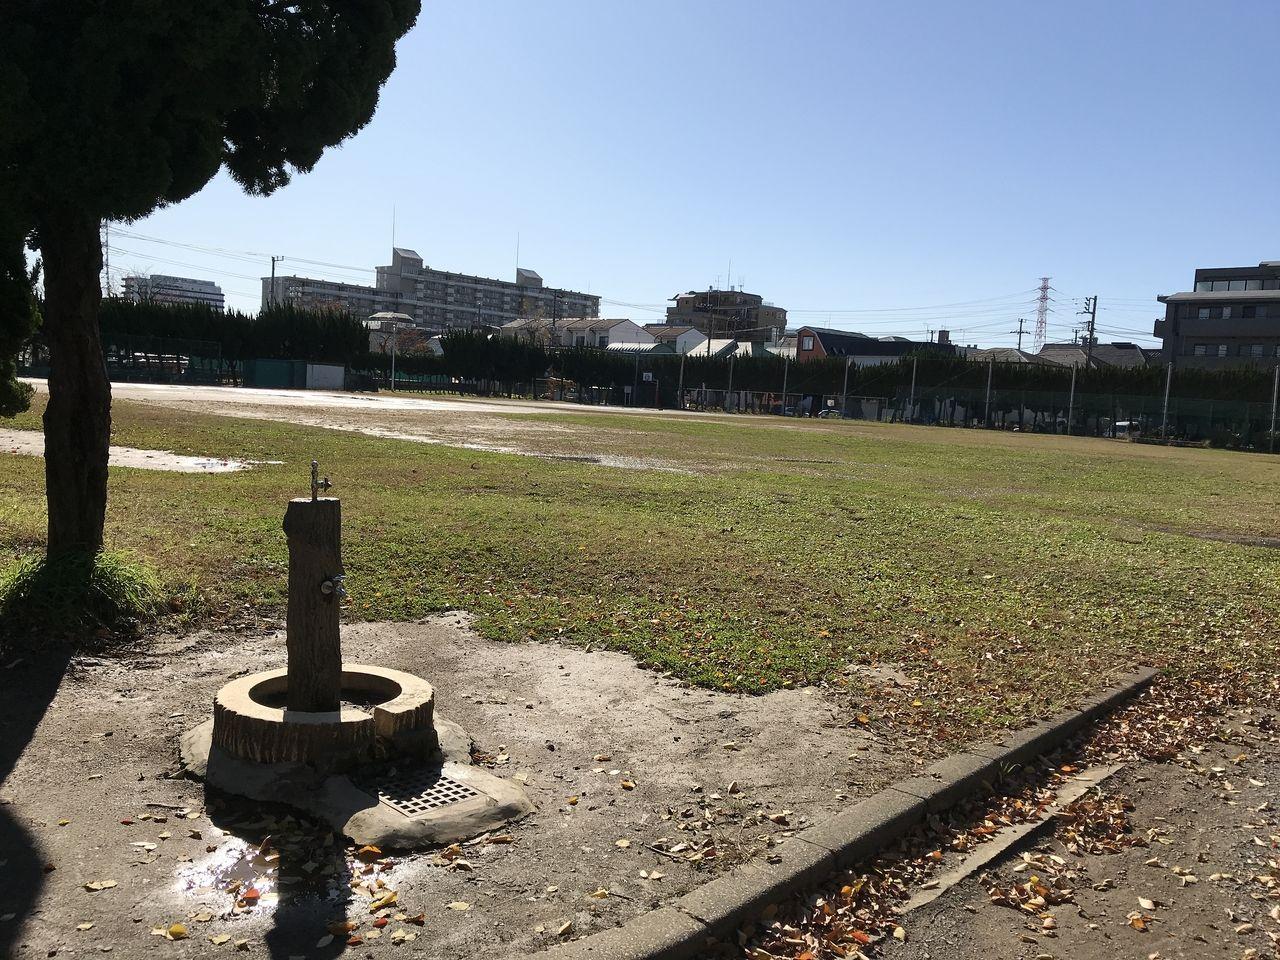 行徳の塩焼中央公園の野球場